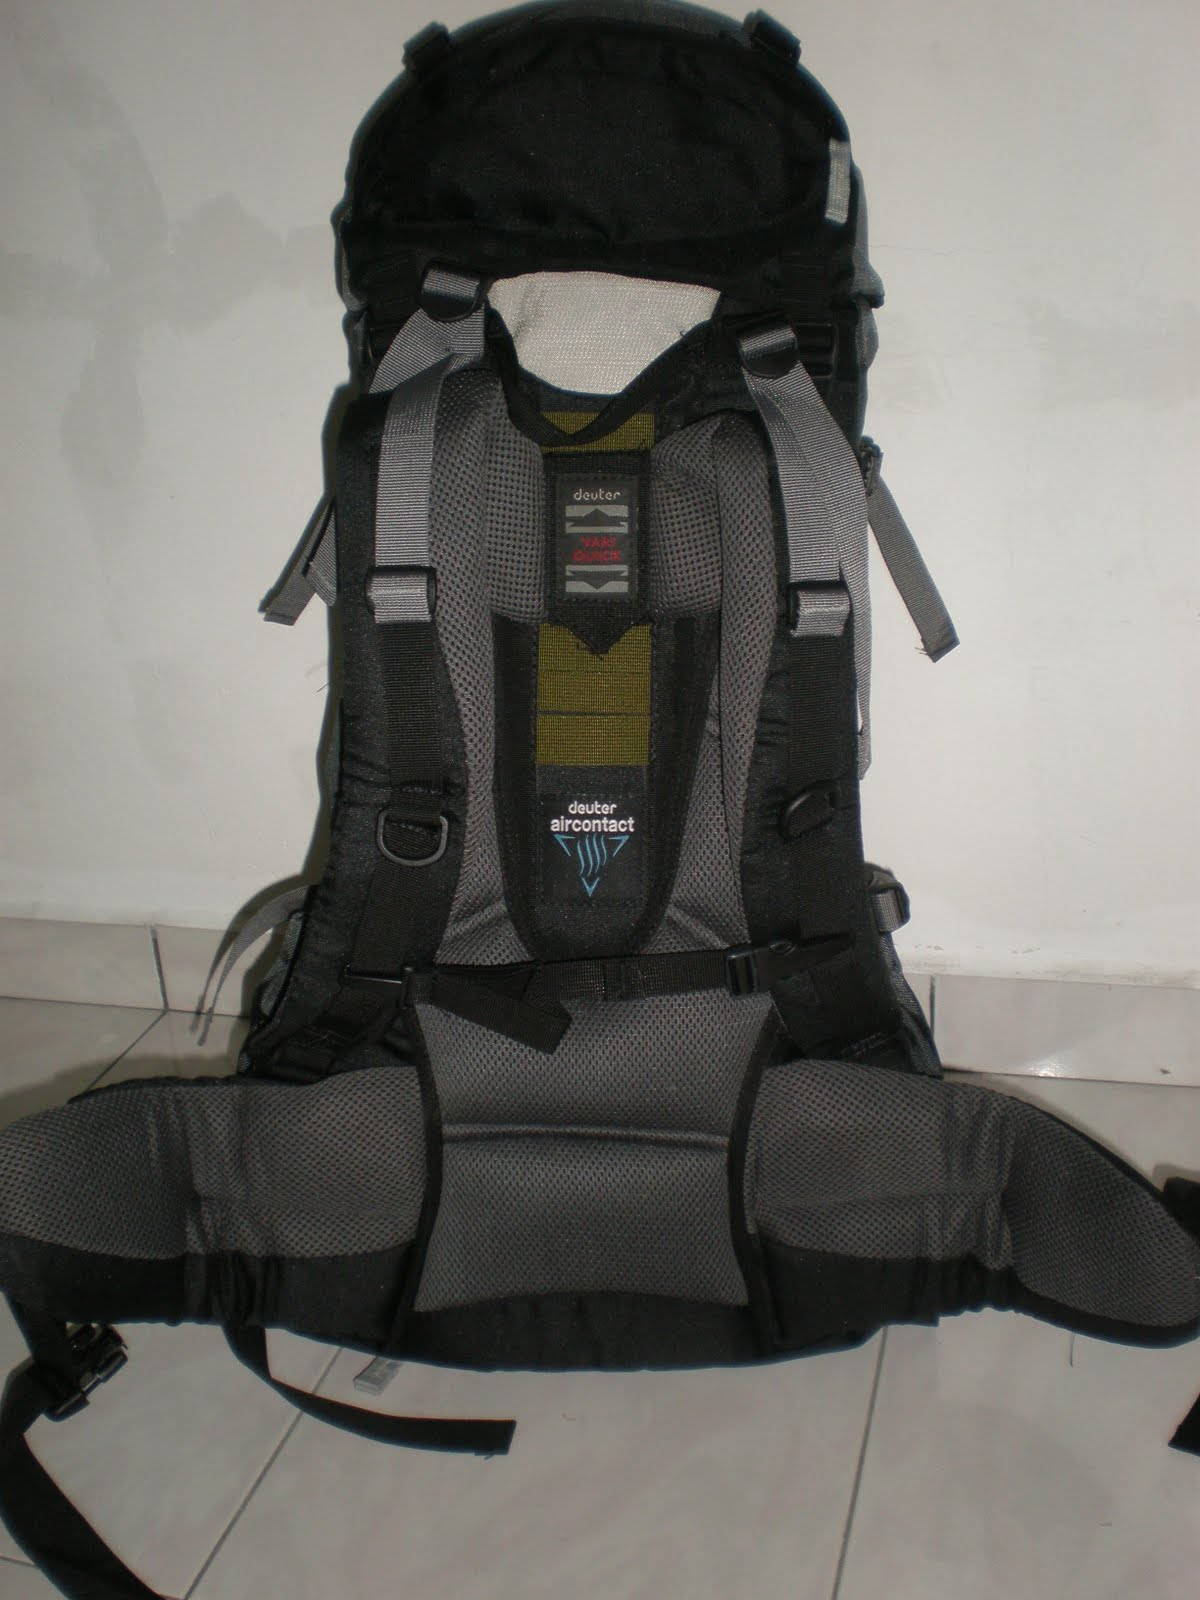 Kamil Shop Deuter Aircontact 40 Plus 10 Sl 160